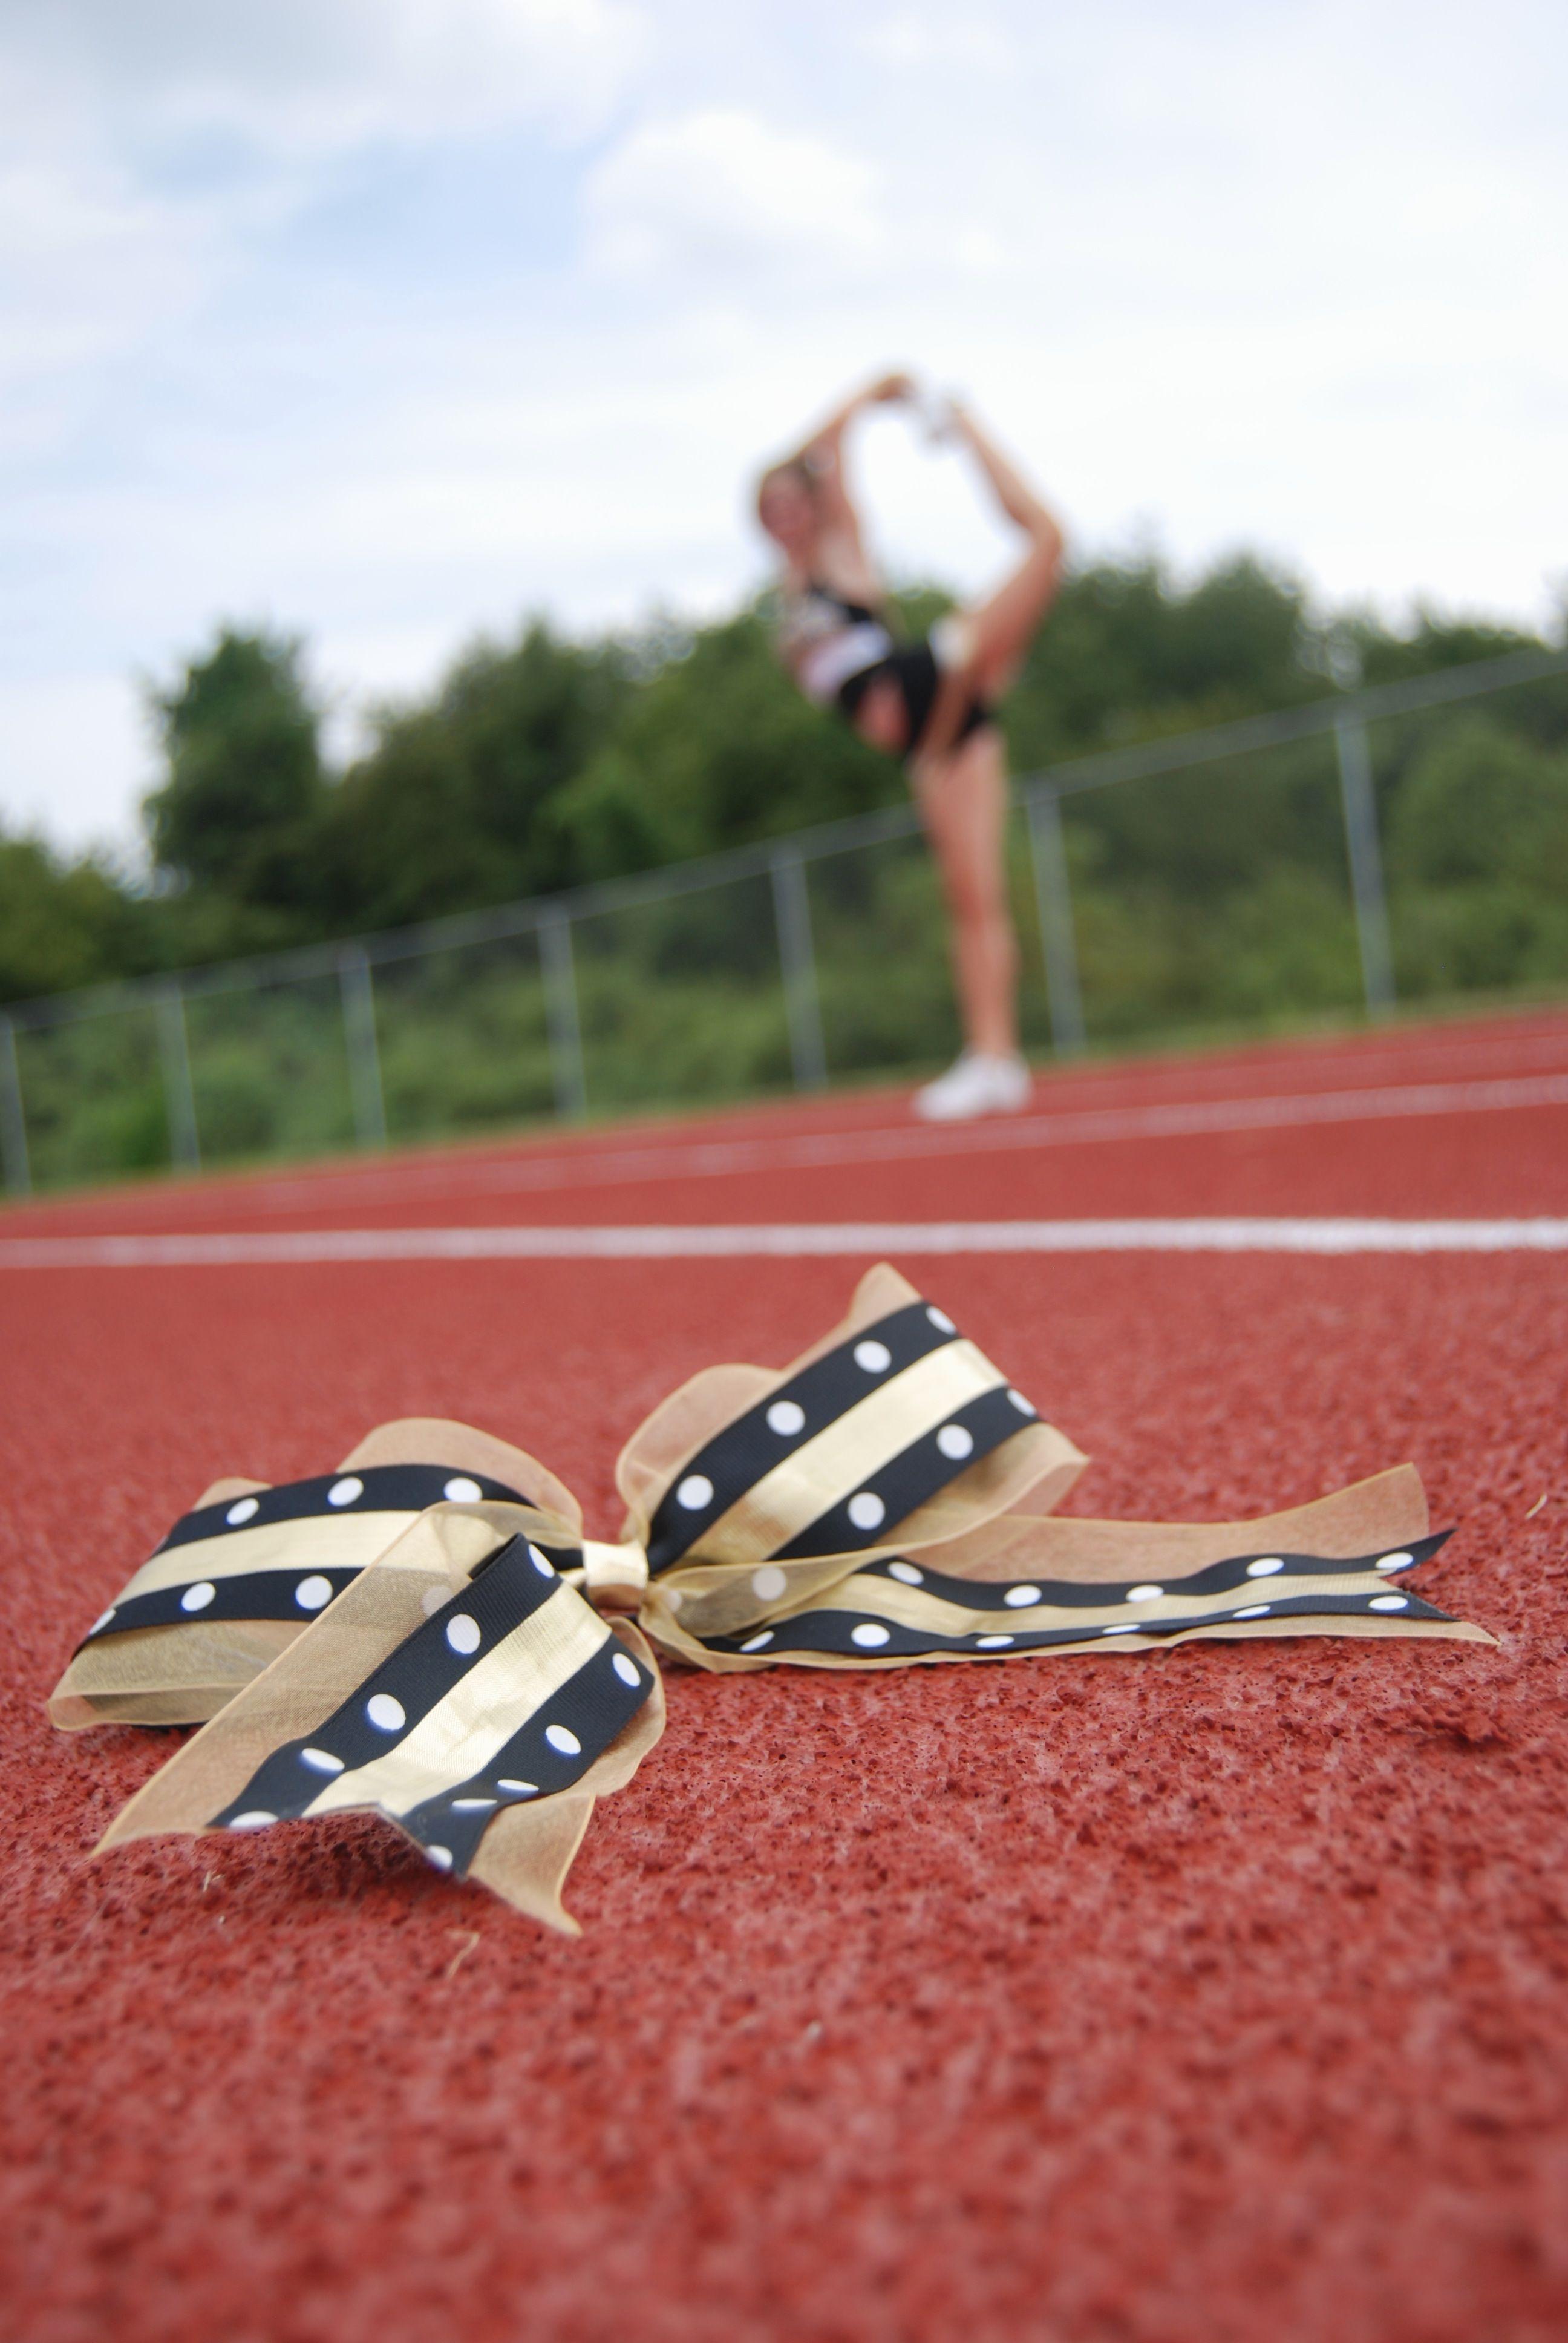 Cheer pic | Photography | Pinterest | Bitte, Fotoideen und Fotos